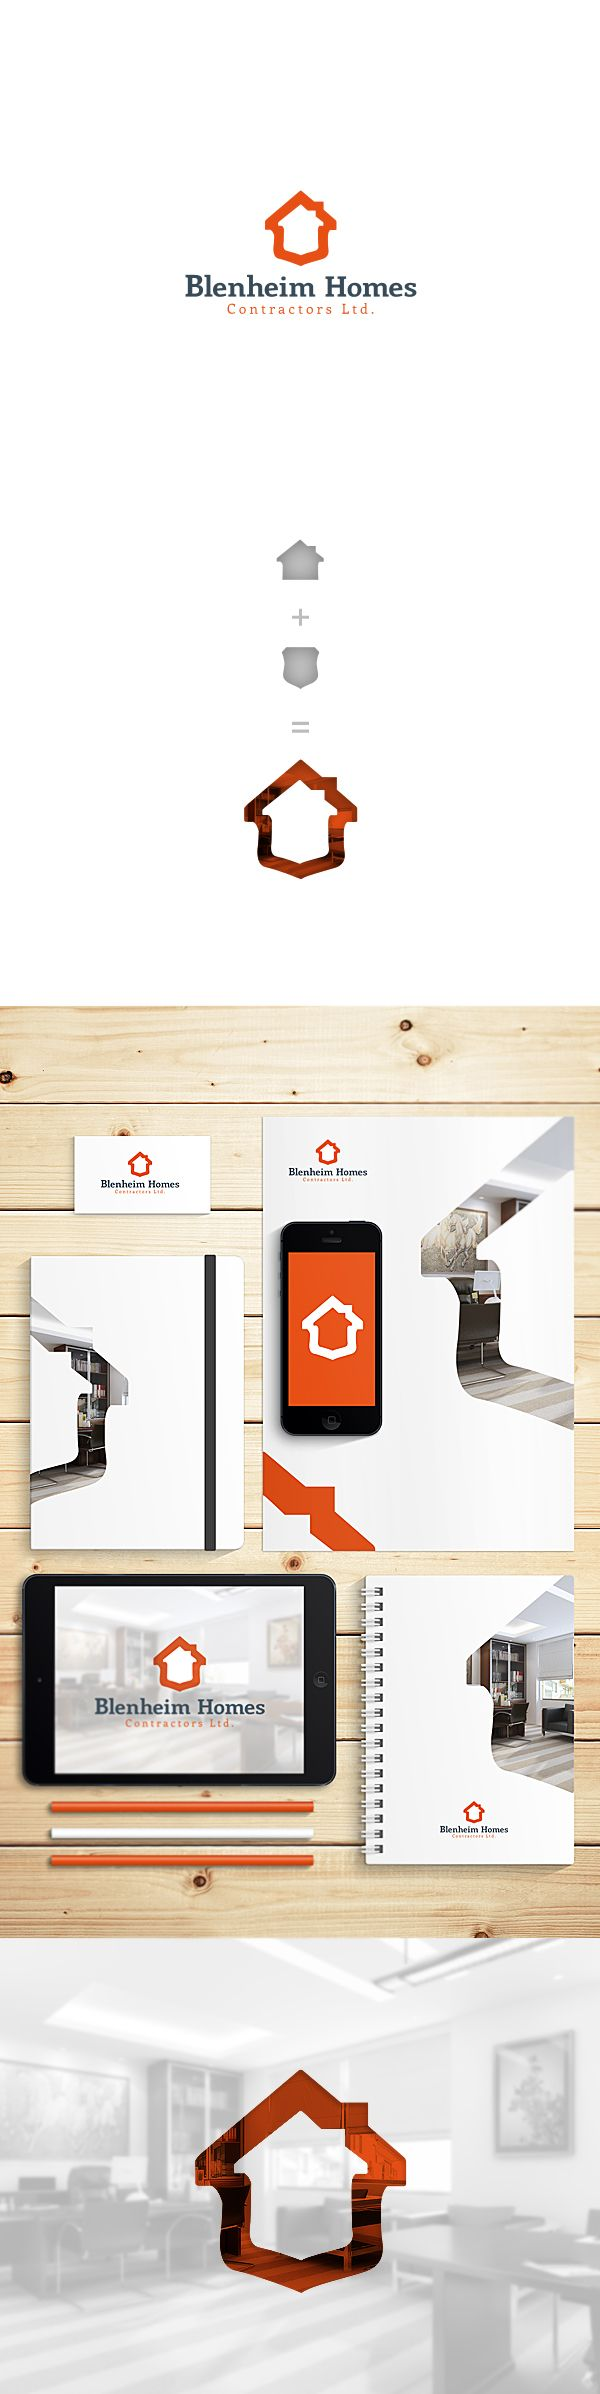 Blenheim Home Contractors Ltd. by Karol Sidorowski, via Behance | #stationary #corporate #design #corporatedesign #identity #branding #marketing < repinned by www.BlickeDeeler.de | Take a look at www.LogoGestaltung-Hamburg.de